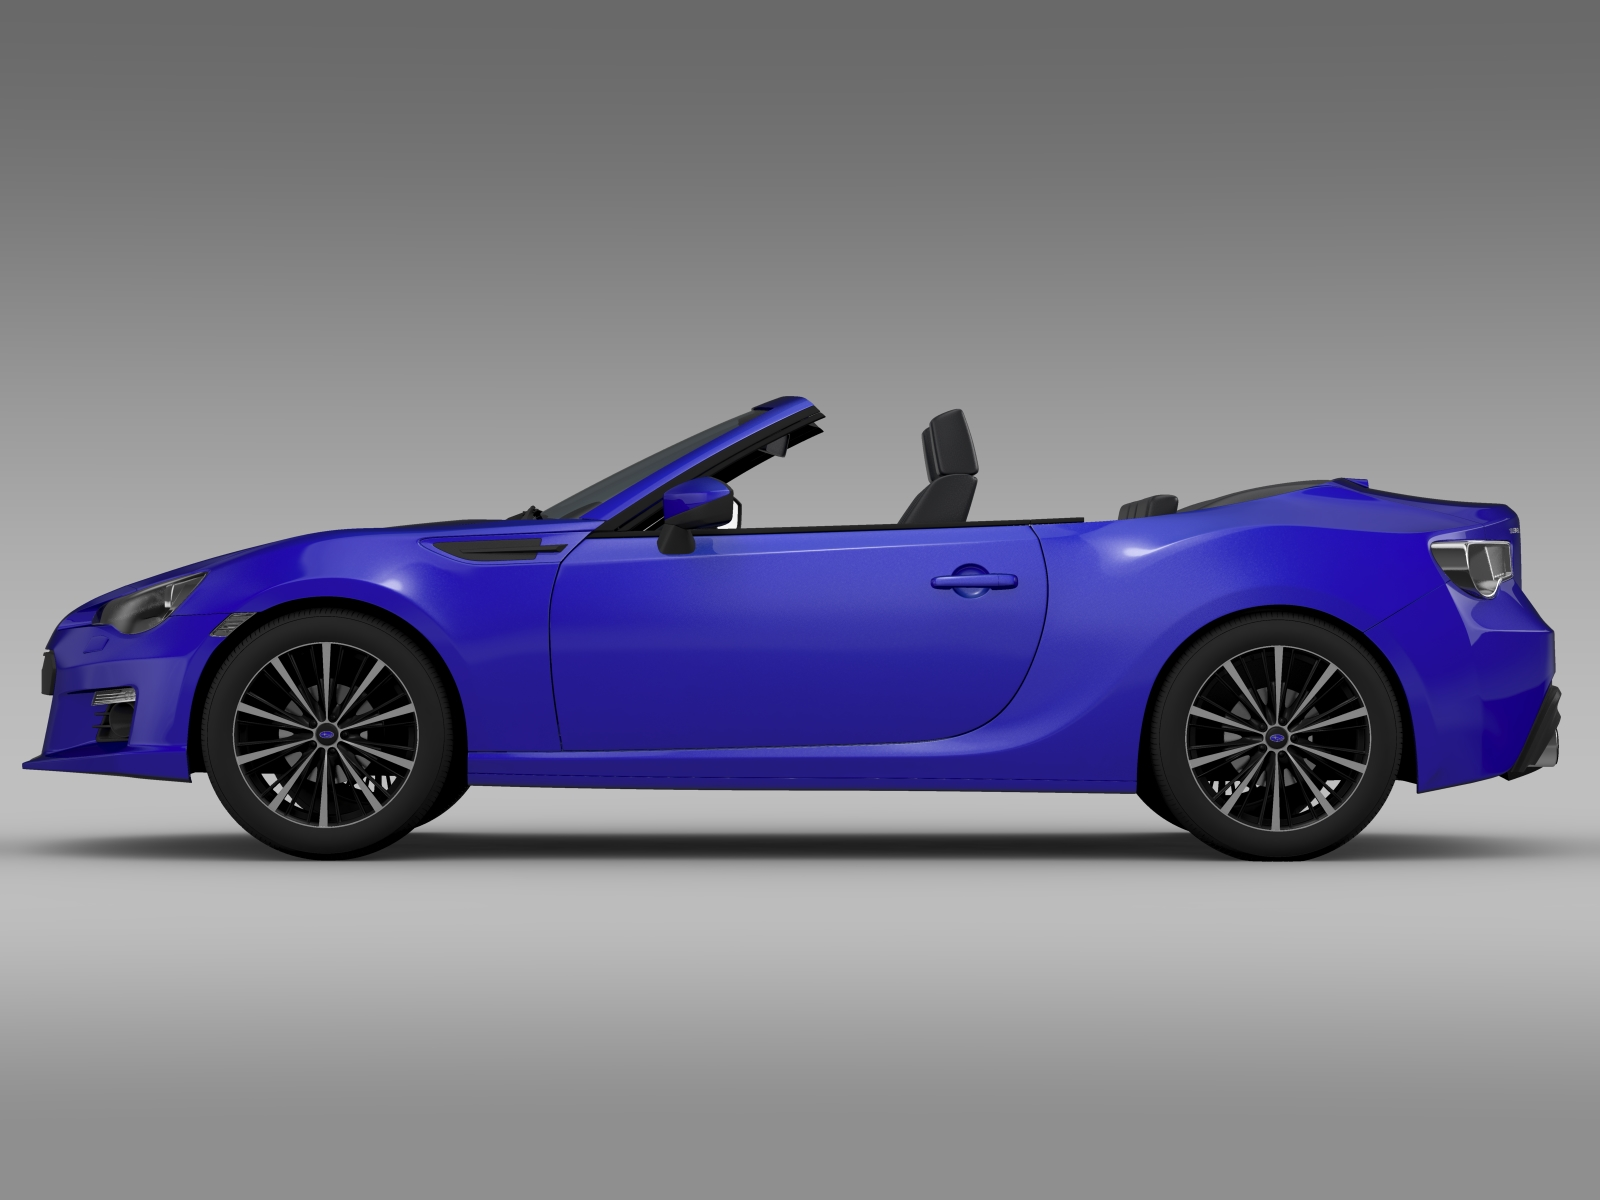 subaru brz zc6 cabrio 2015 3d model flatpyramid. Black Bedroom Furniture Sets. Home Design Ideas